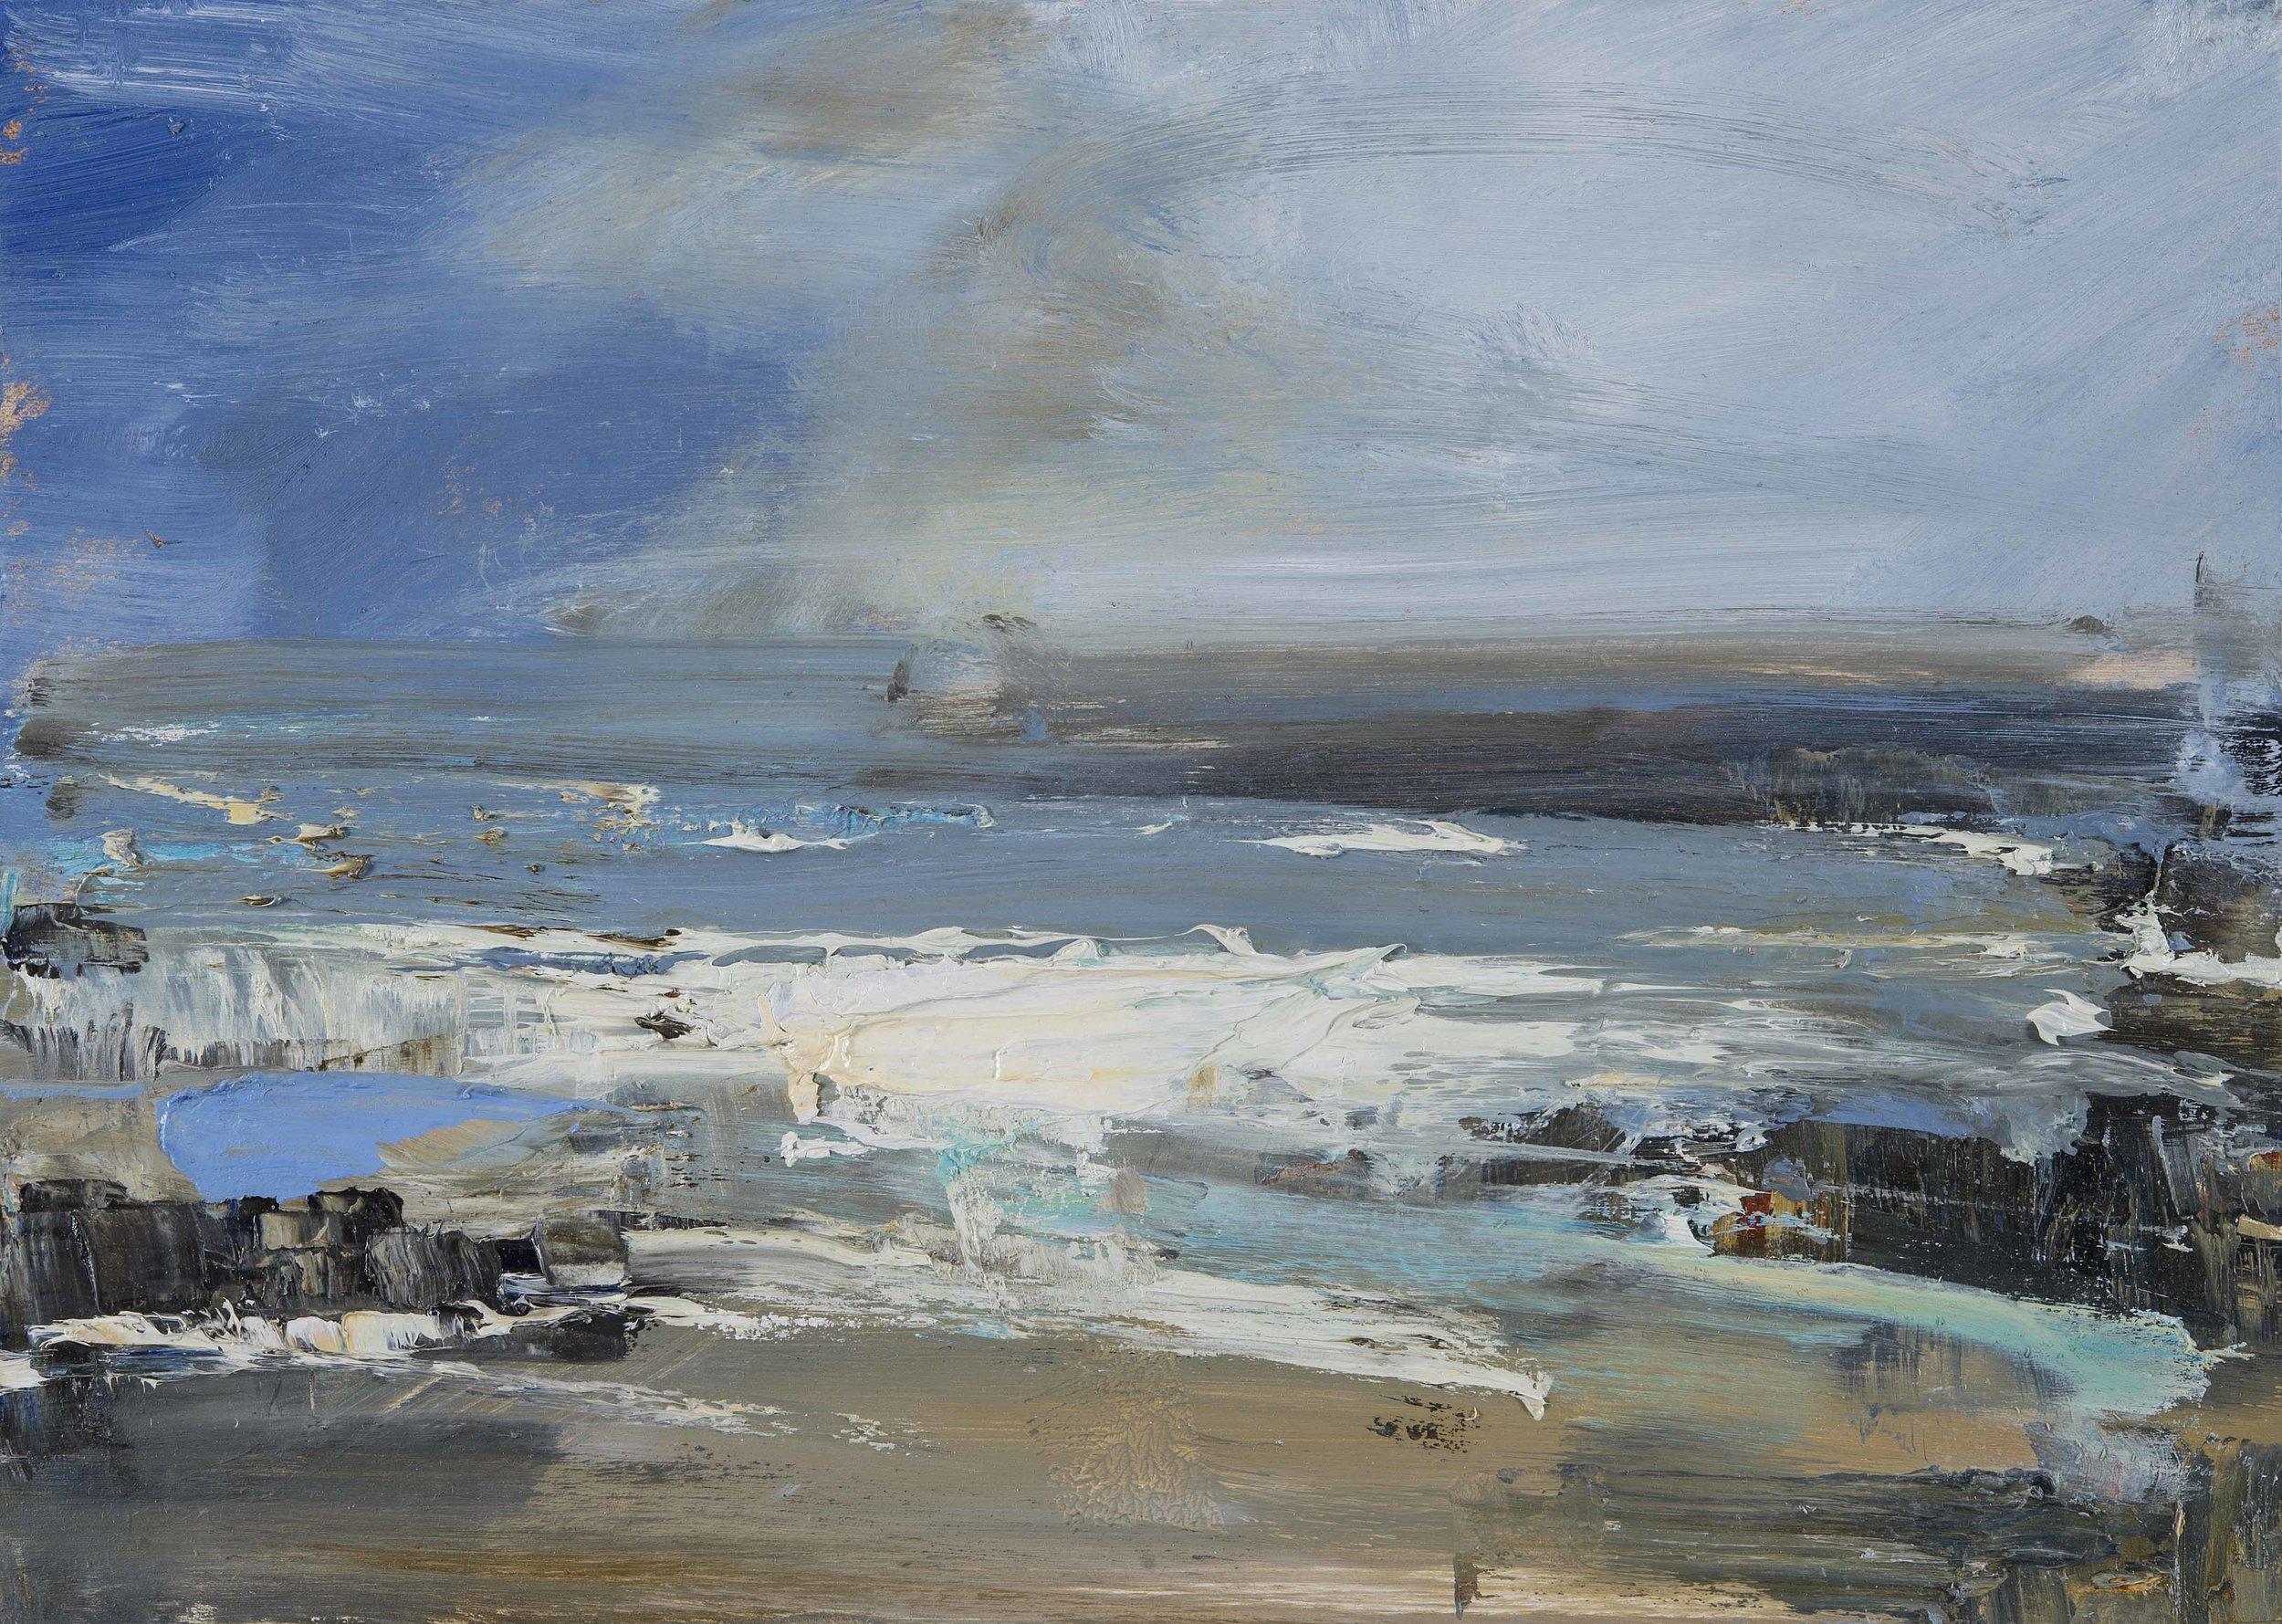 Gwithian Blue. Hannah Woodman 2014. Oil on board. 25 x 35cm (2).jpg